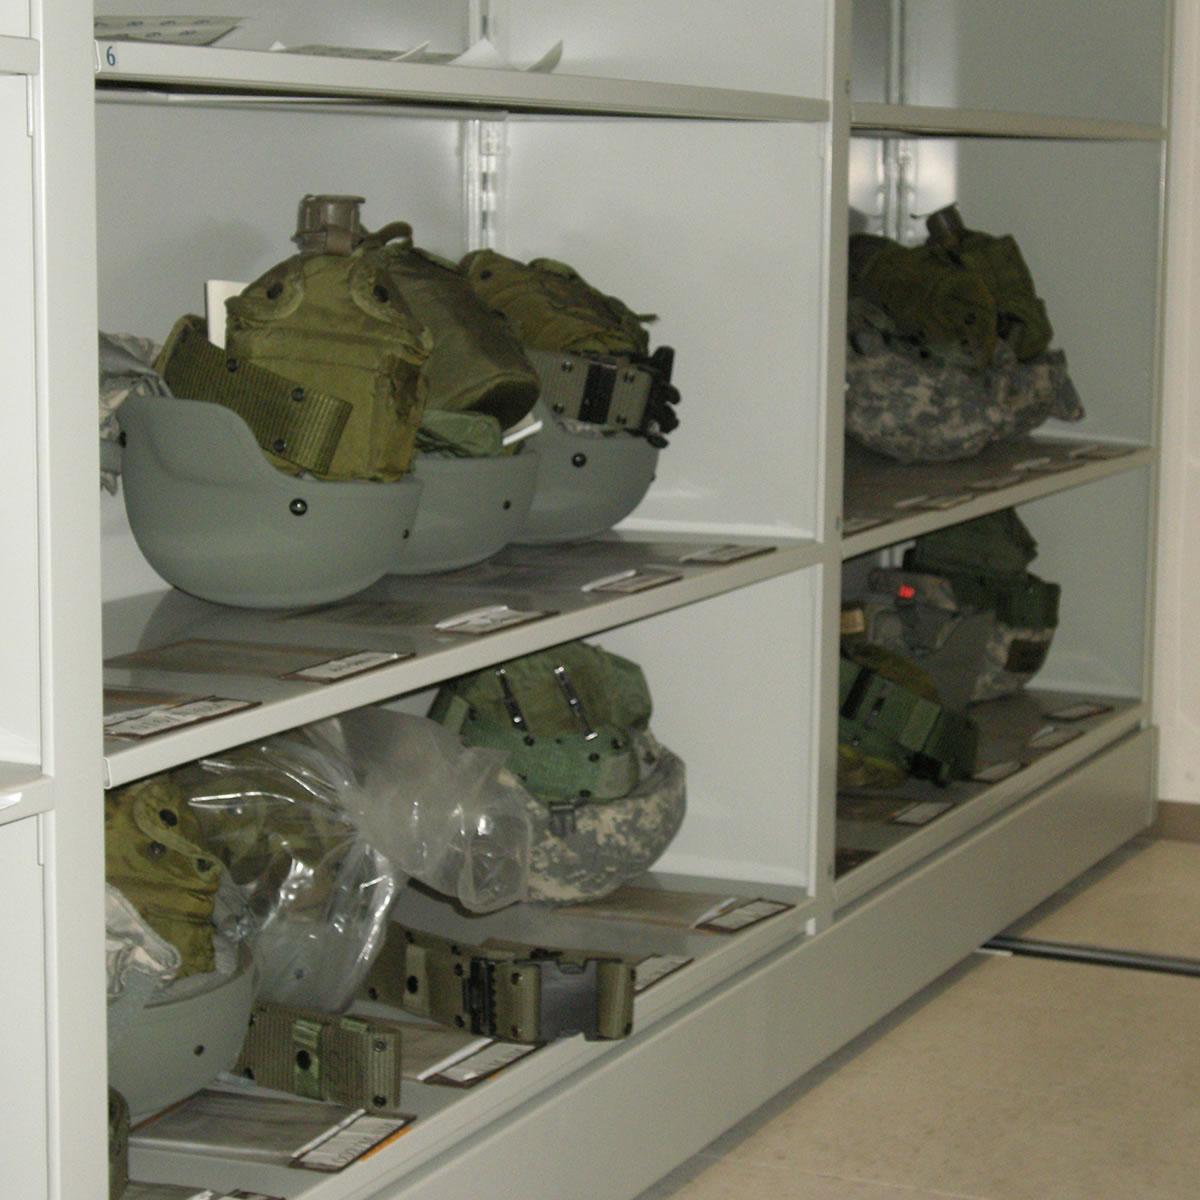 Square Military Helmet Shelving System